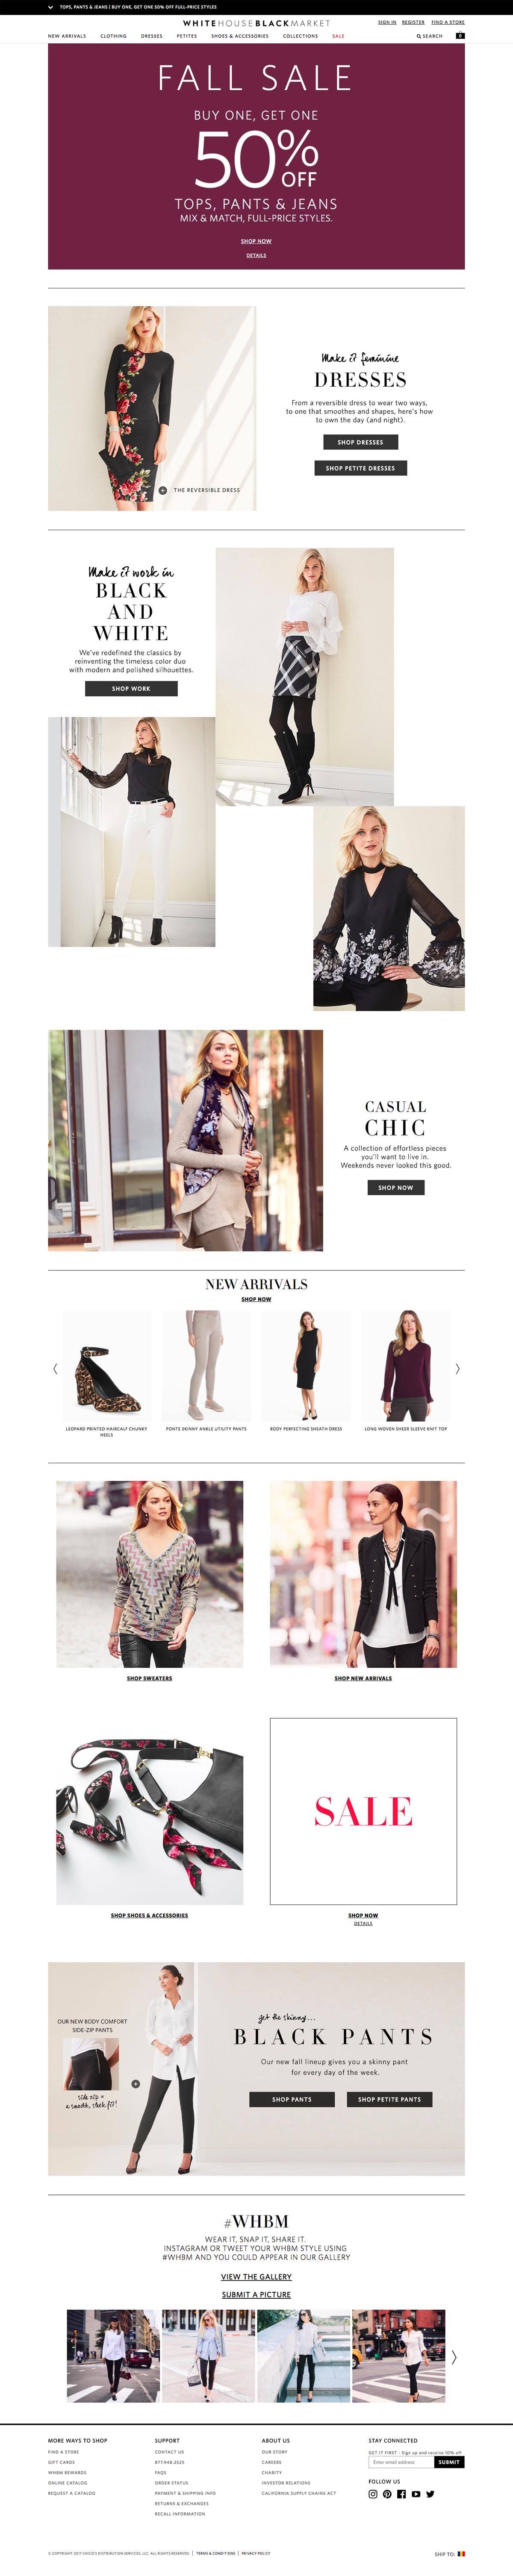 eCommerce website: White House Black Market